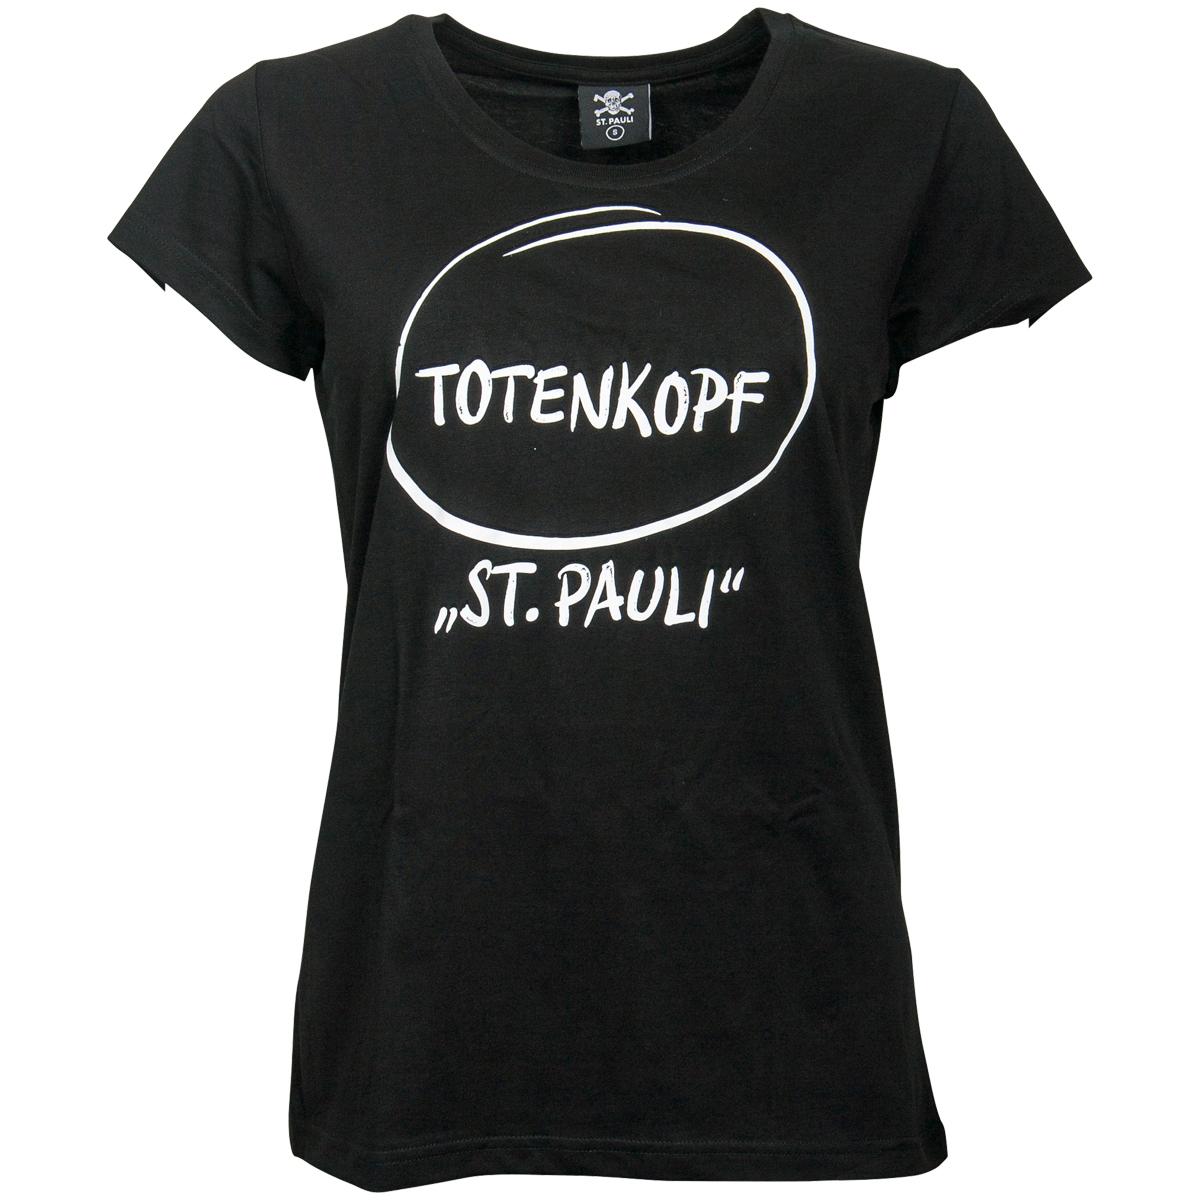 FC St. Pauli - Damen T-Shirt Marketing First Totenkopf - schwarz